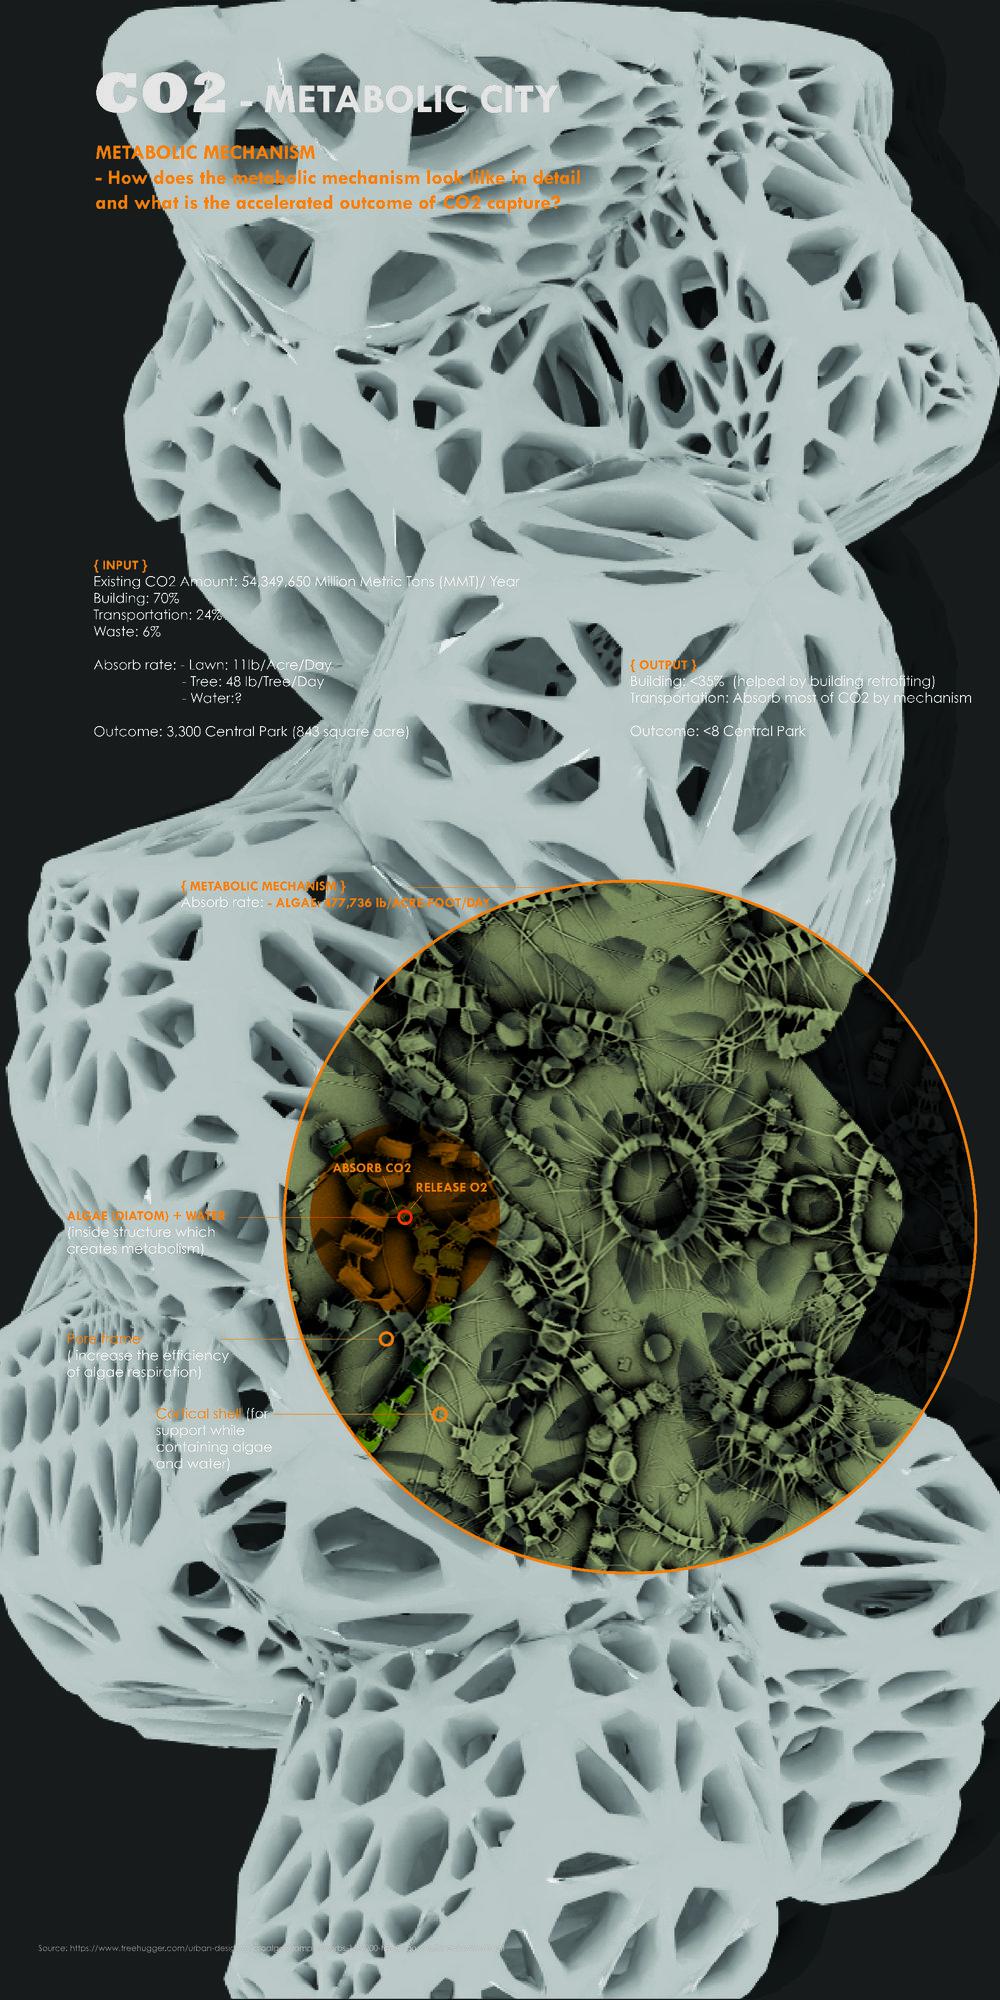 Metabolic mechanism inside